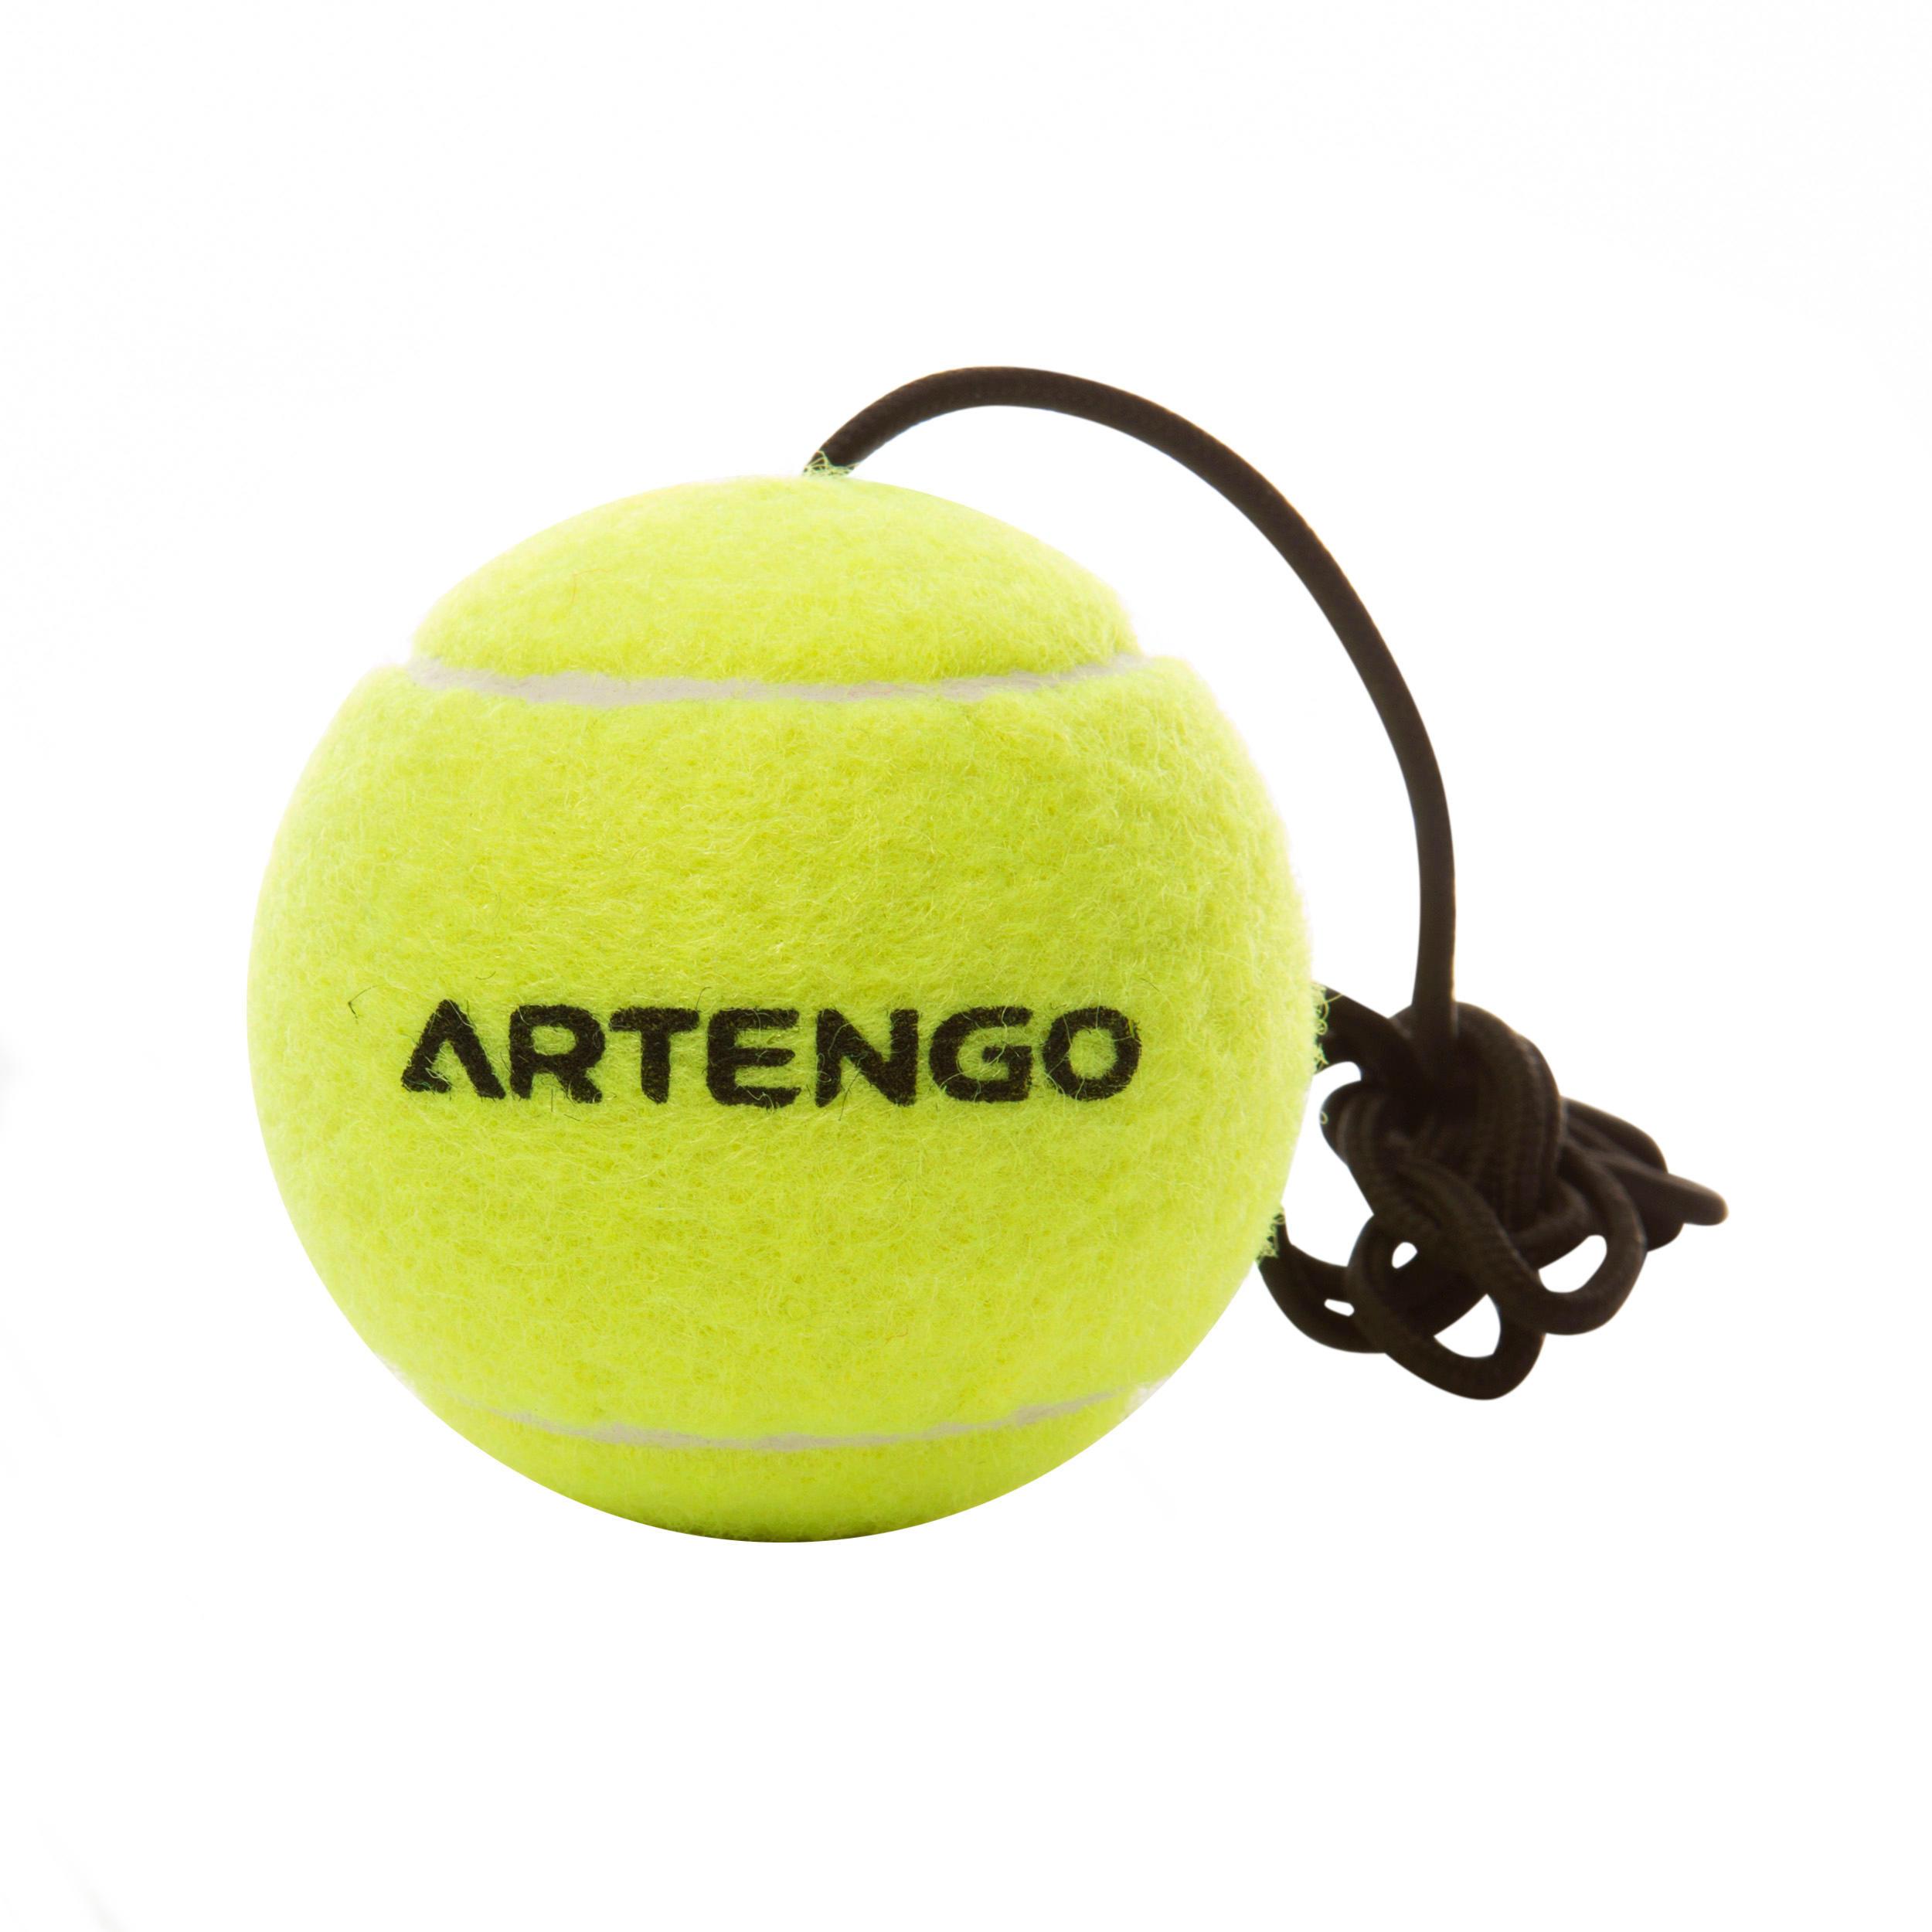 Artengo Turnball Tennis Ball